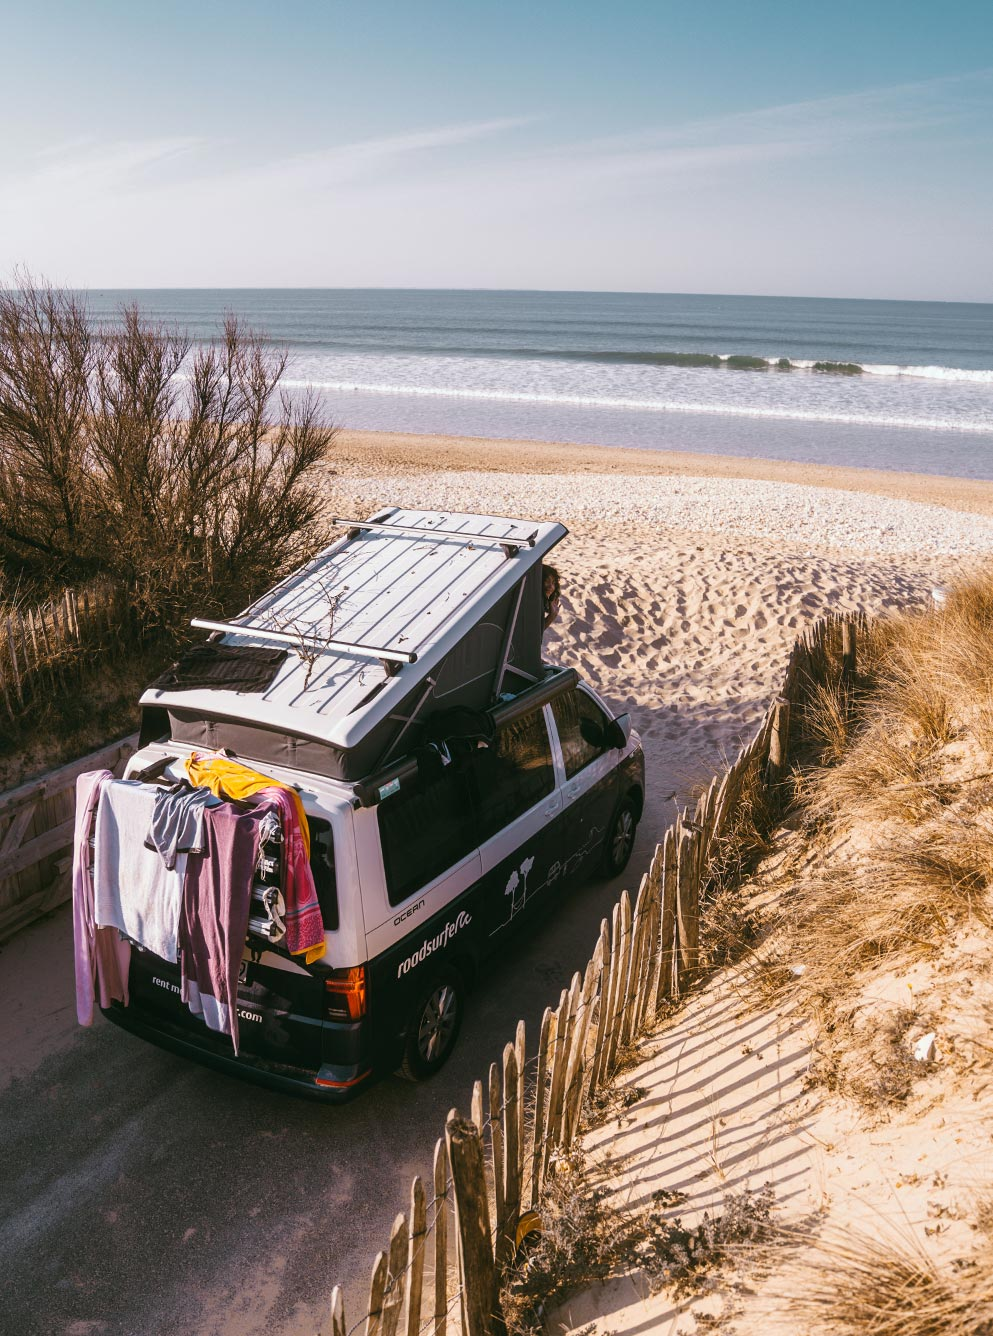 campervan at the beach